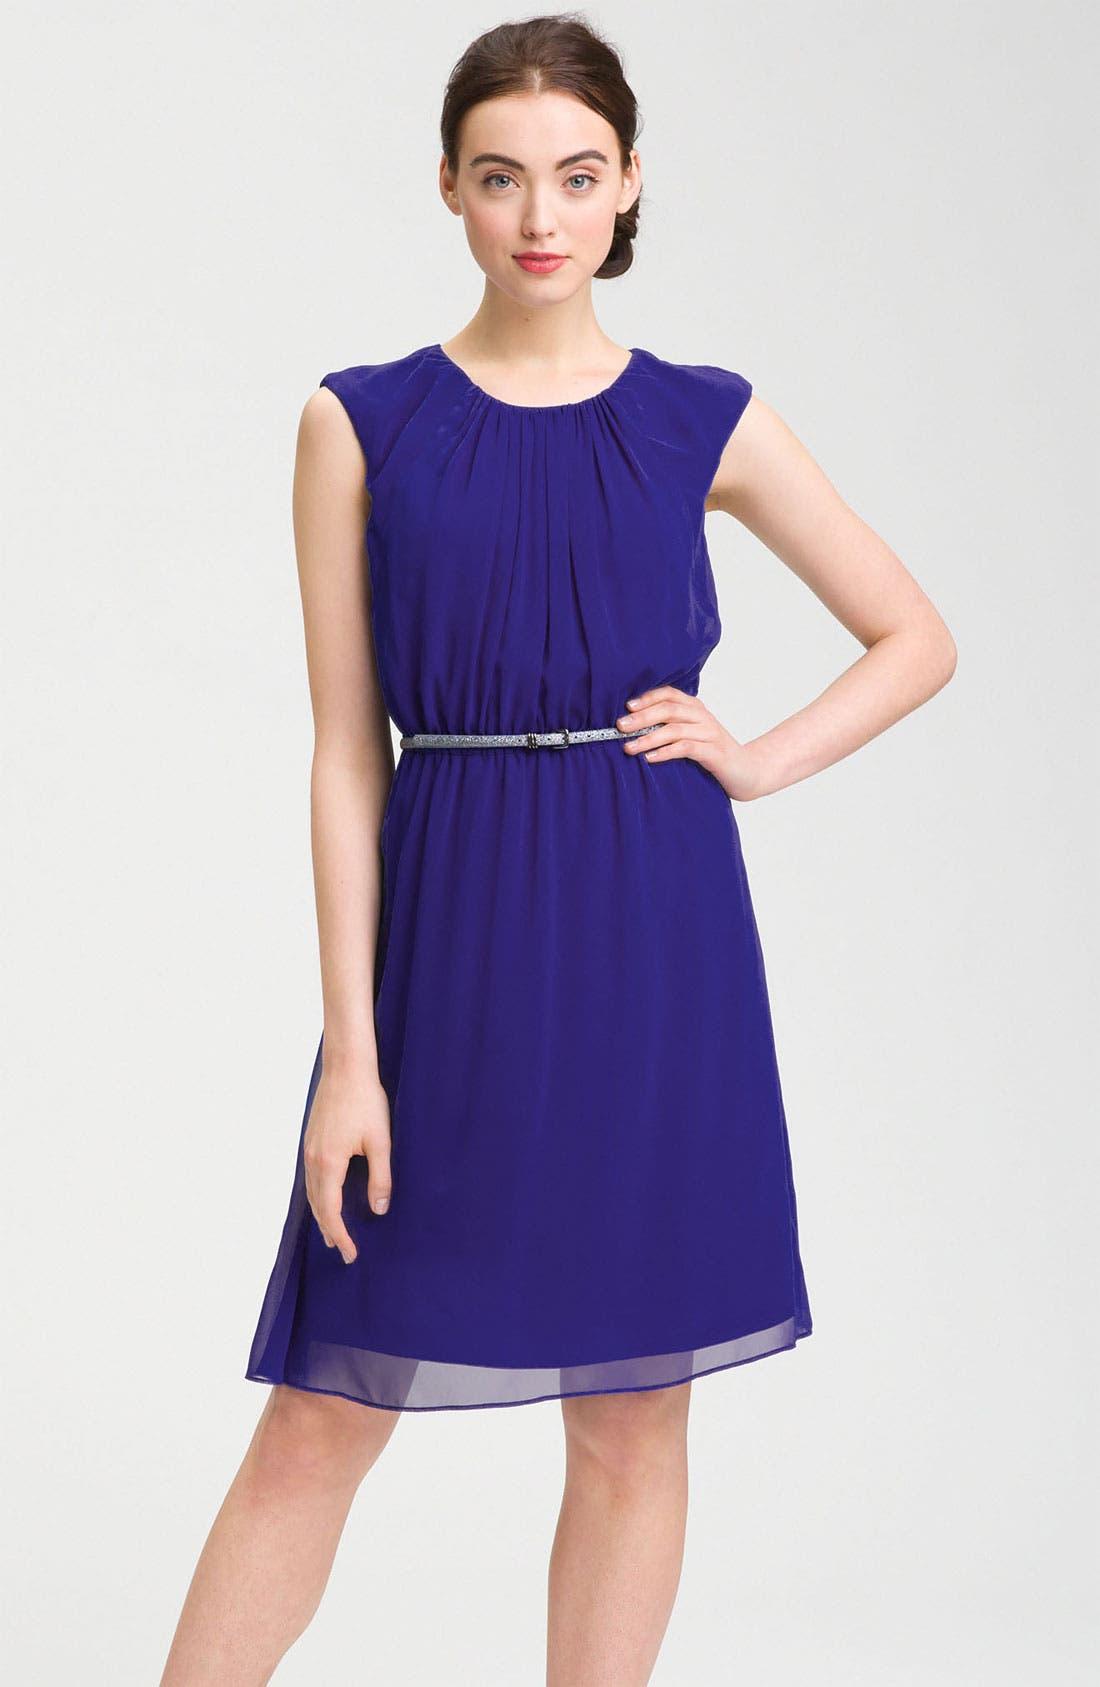 Alternate Image 1 Selected - Calvin Klein Cap Sleeve Belted Crêpe de Chine Dress